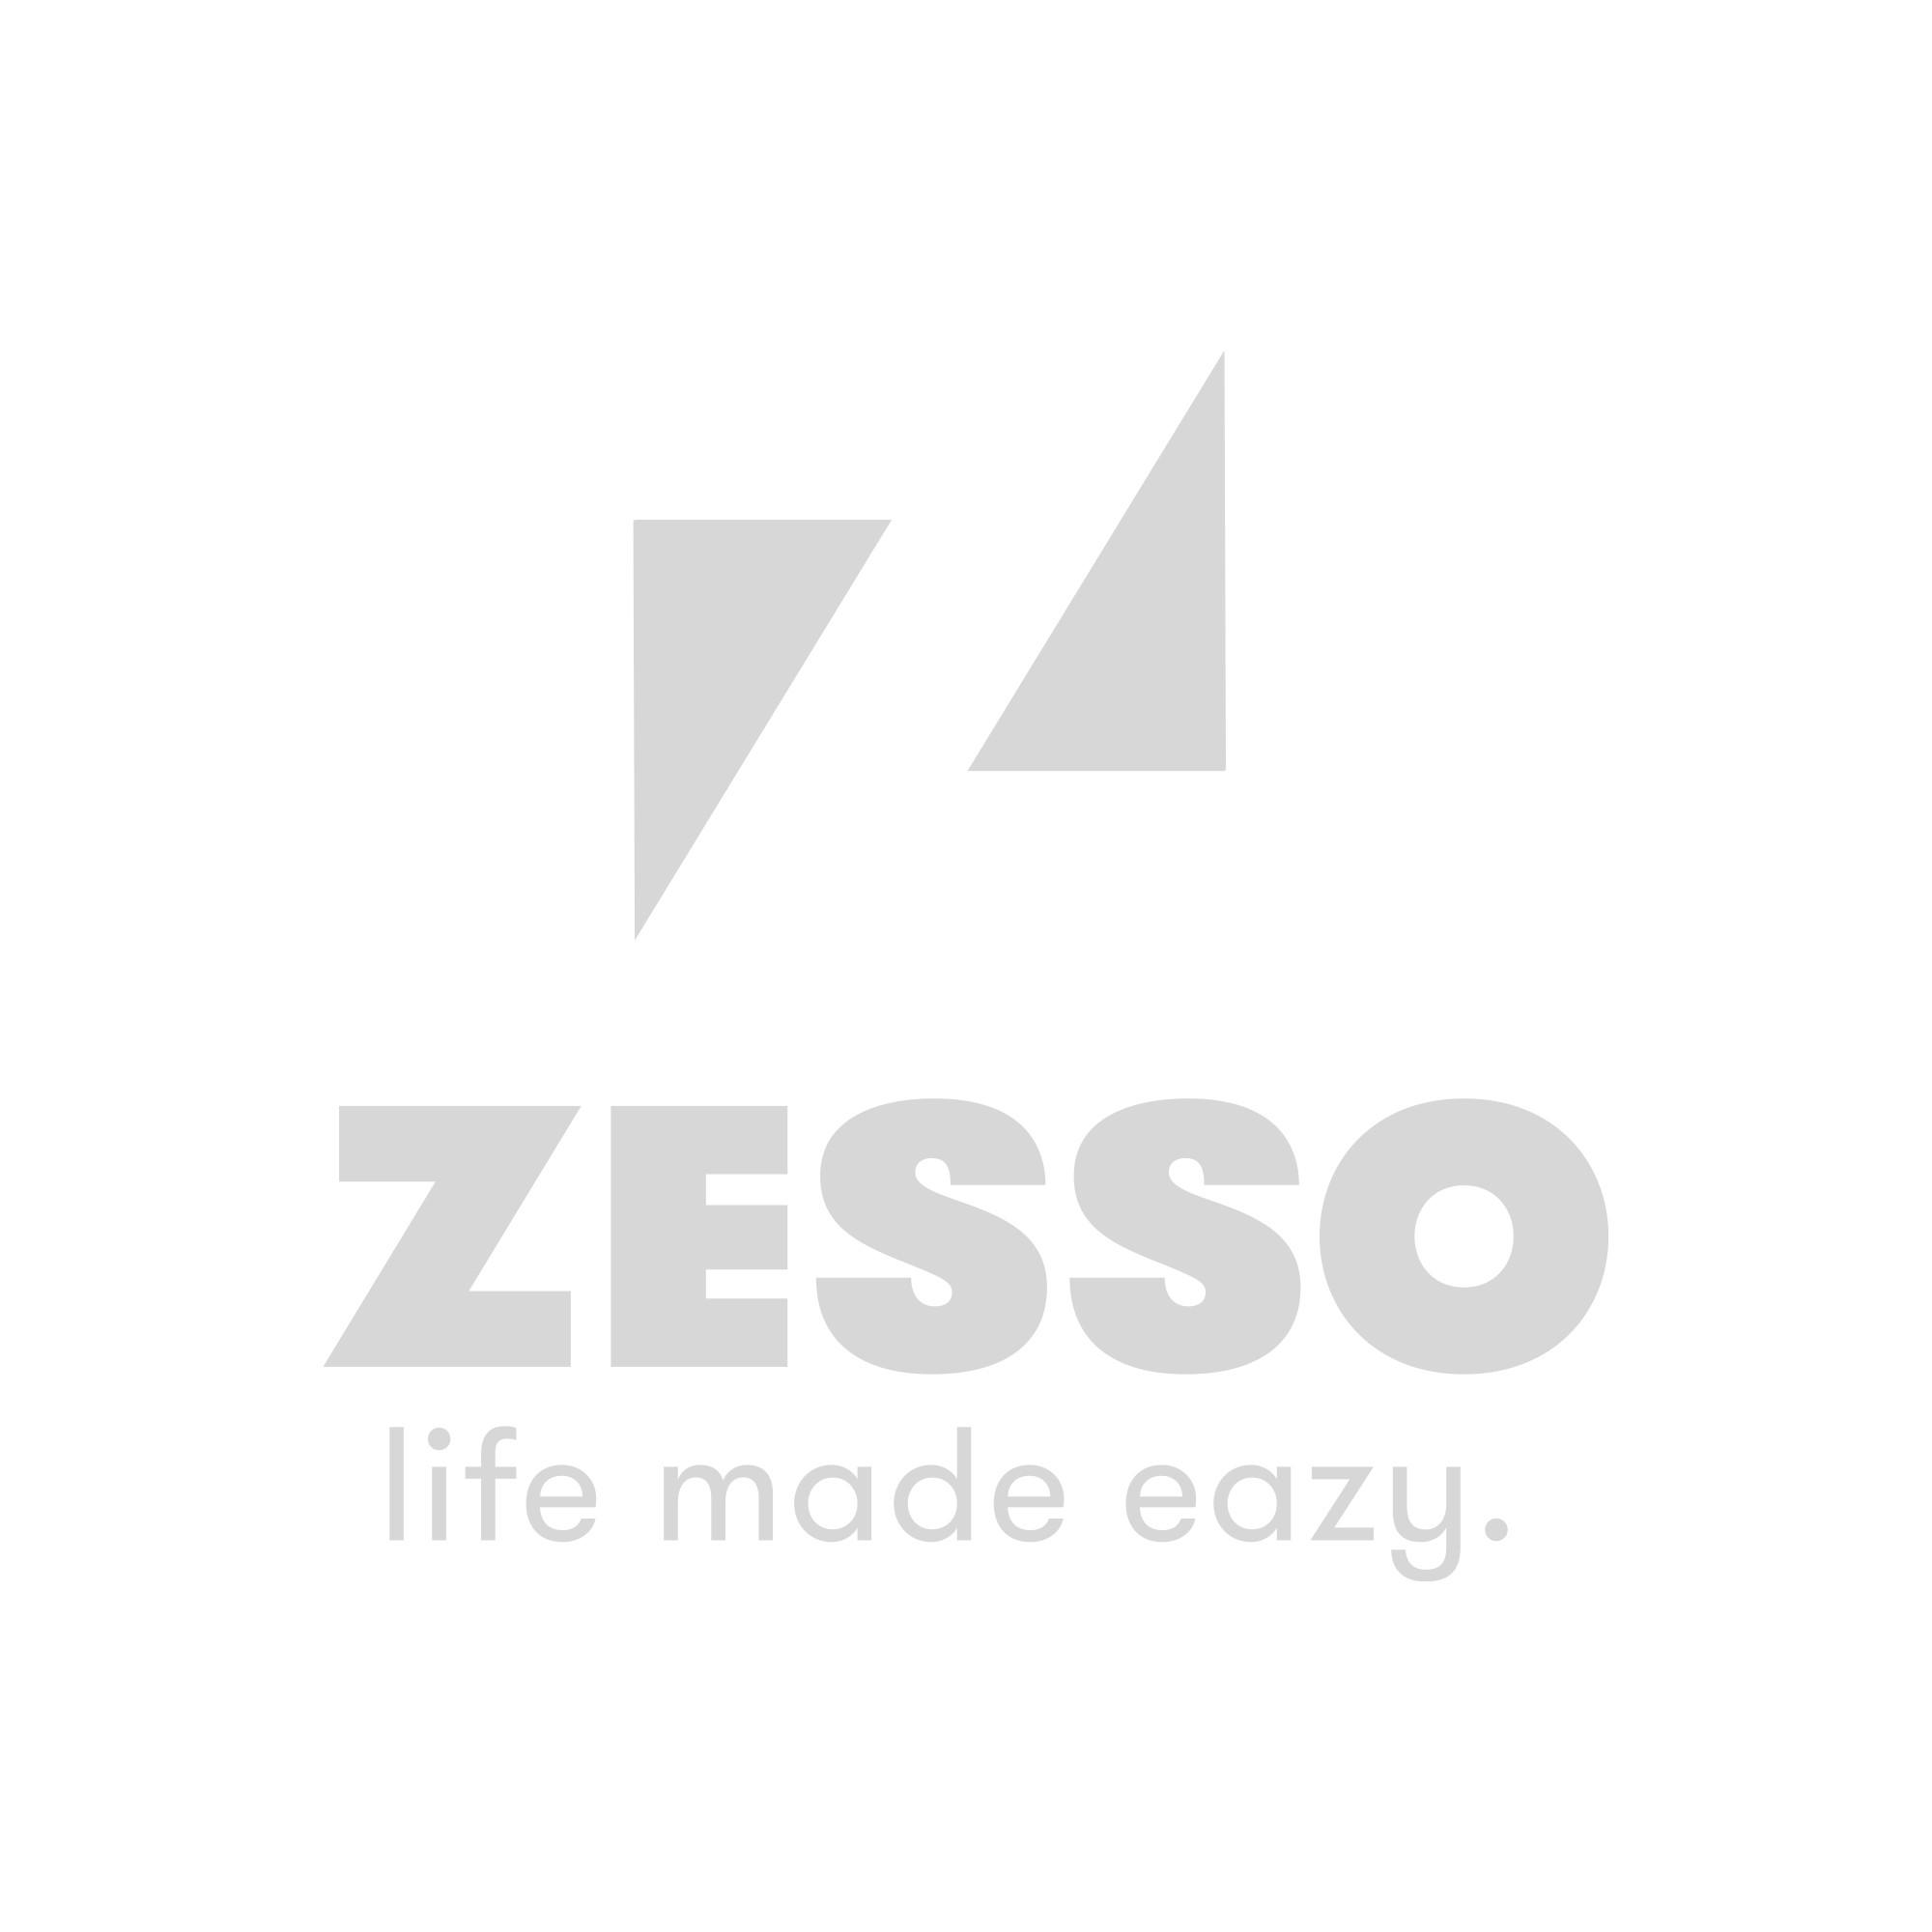 Baytex Impression Sur Toile Tour Eiffel 40 Cm X 80 Cm